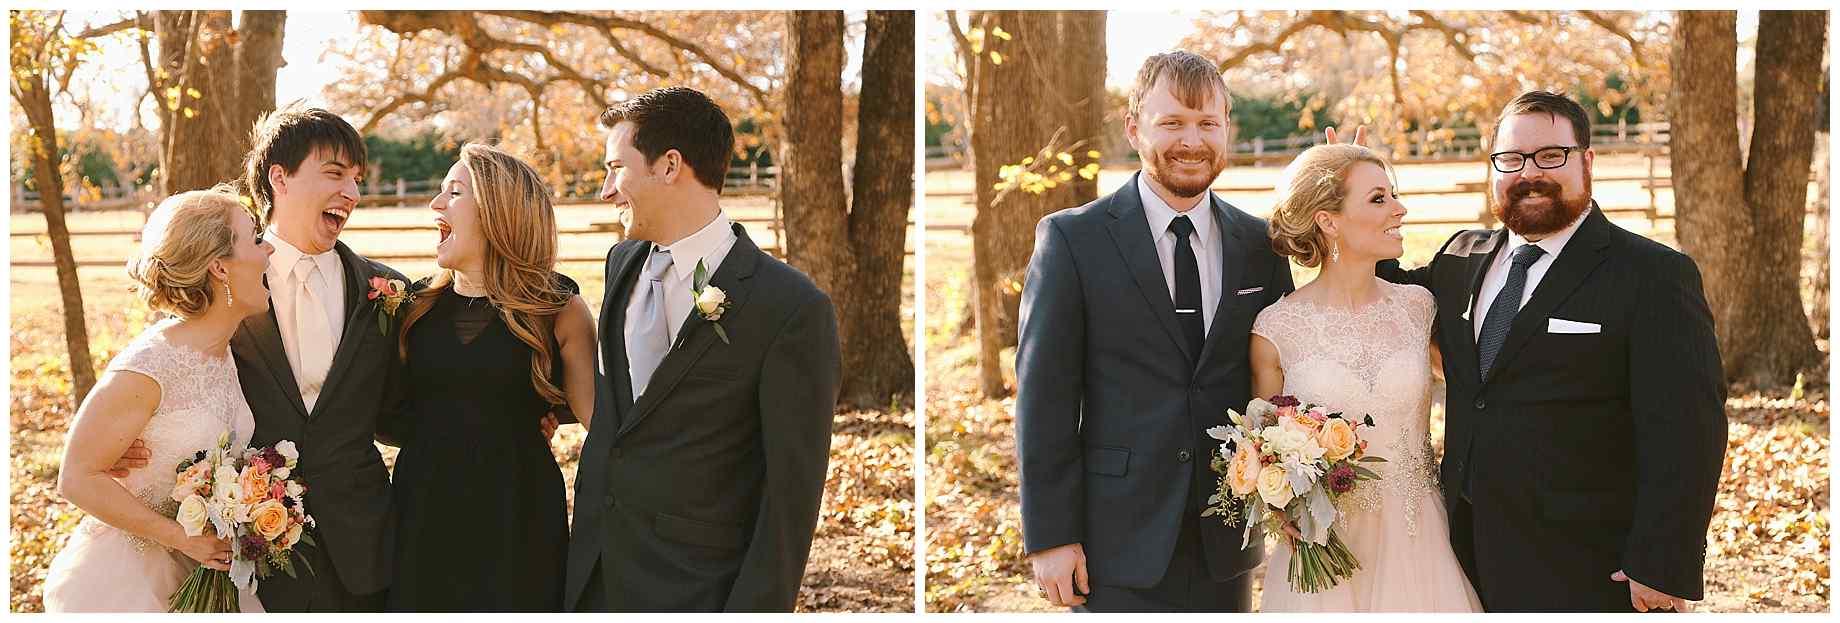 best-stone-oak-ranch-wedding-ever-00023